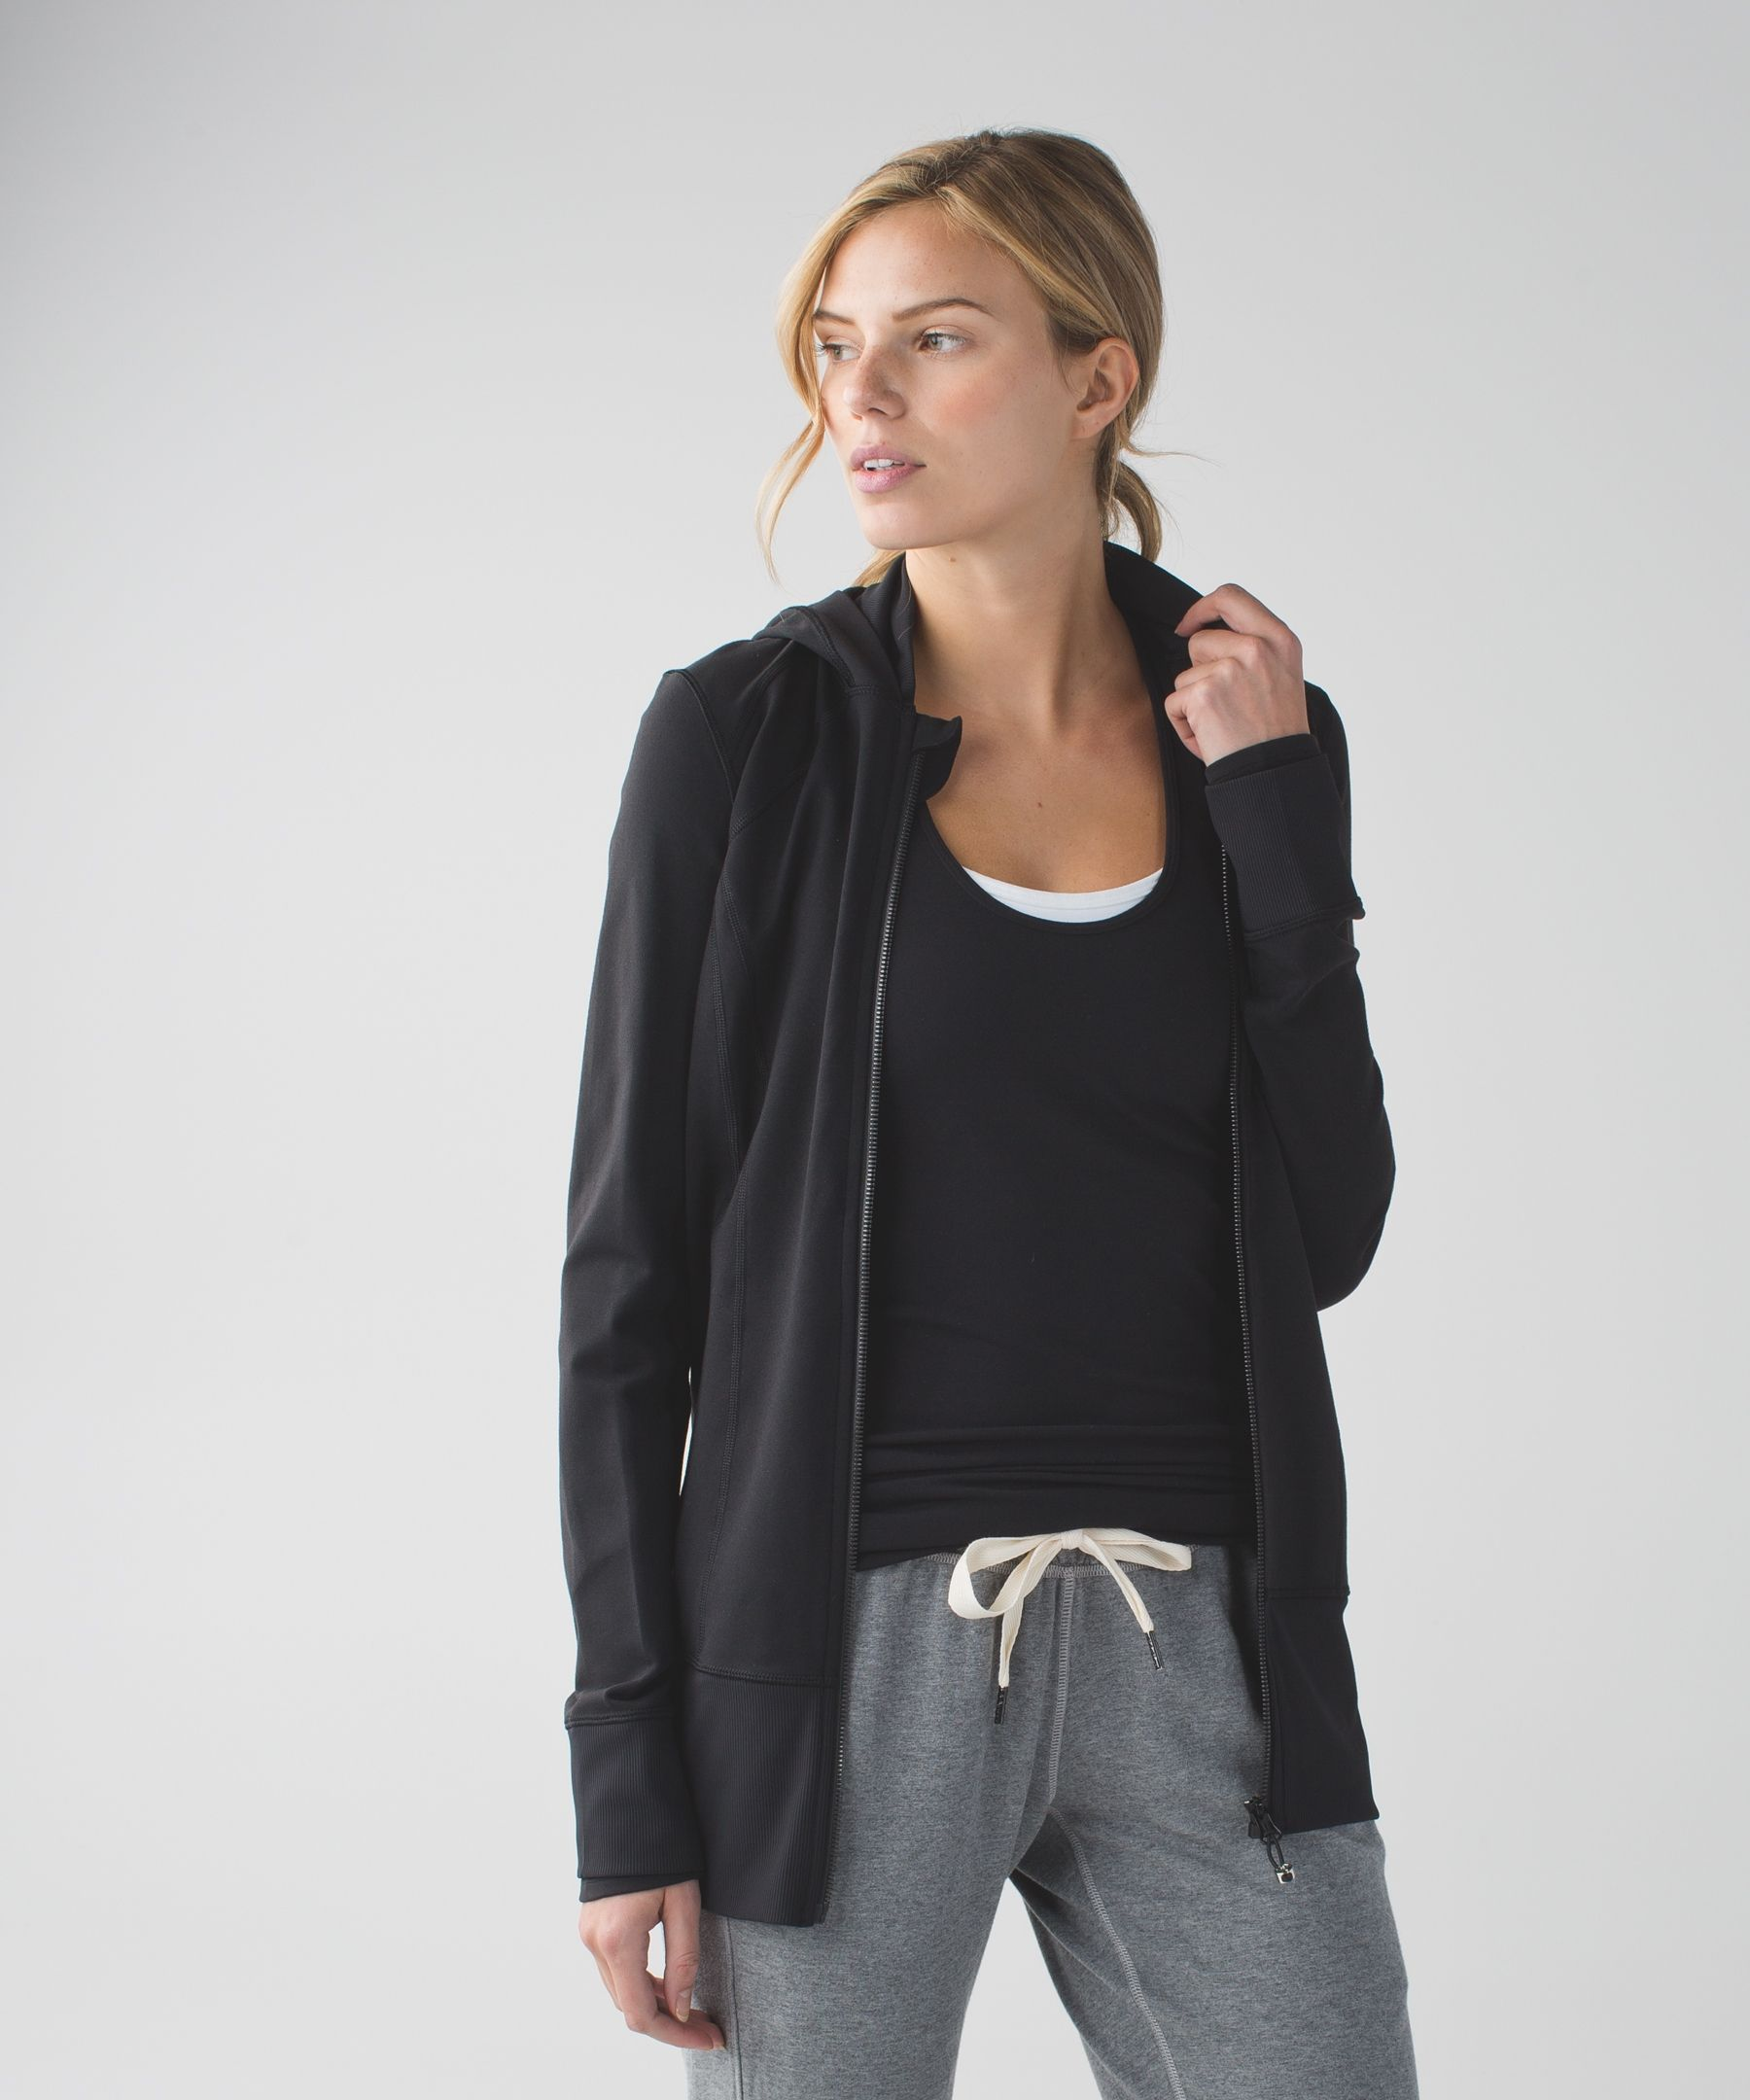 cc165b1202f08 Women s Yoga Jacket - (Black